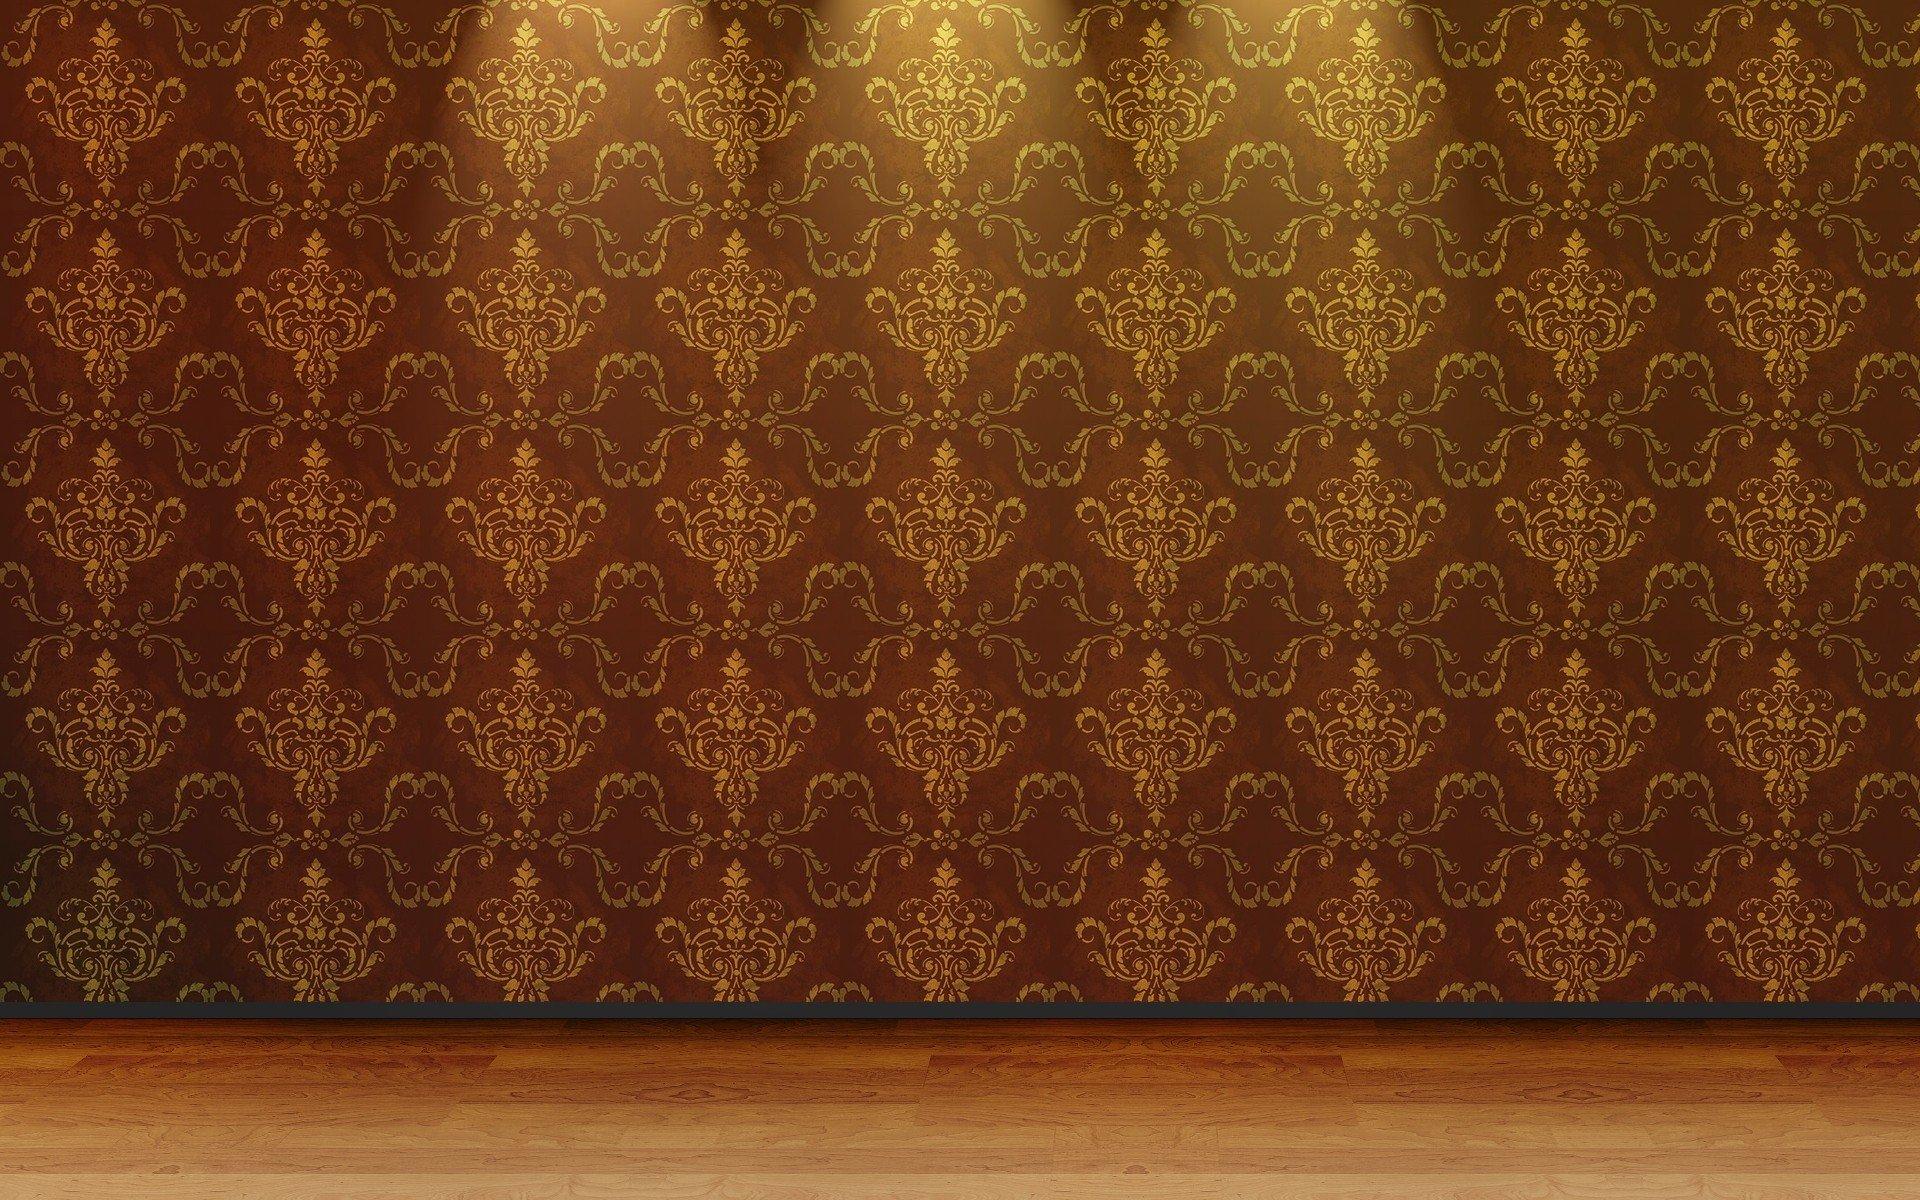 3d wood wallpaper wallpapersafari - Hd room background images ...